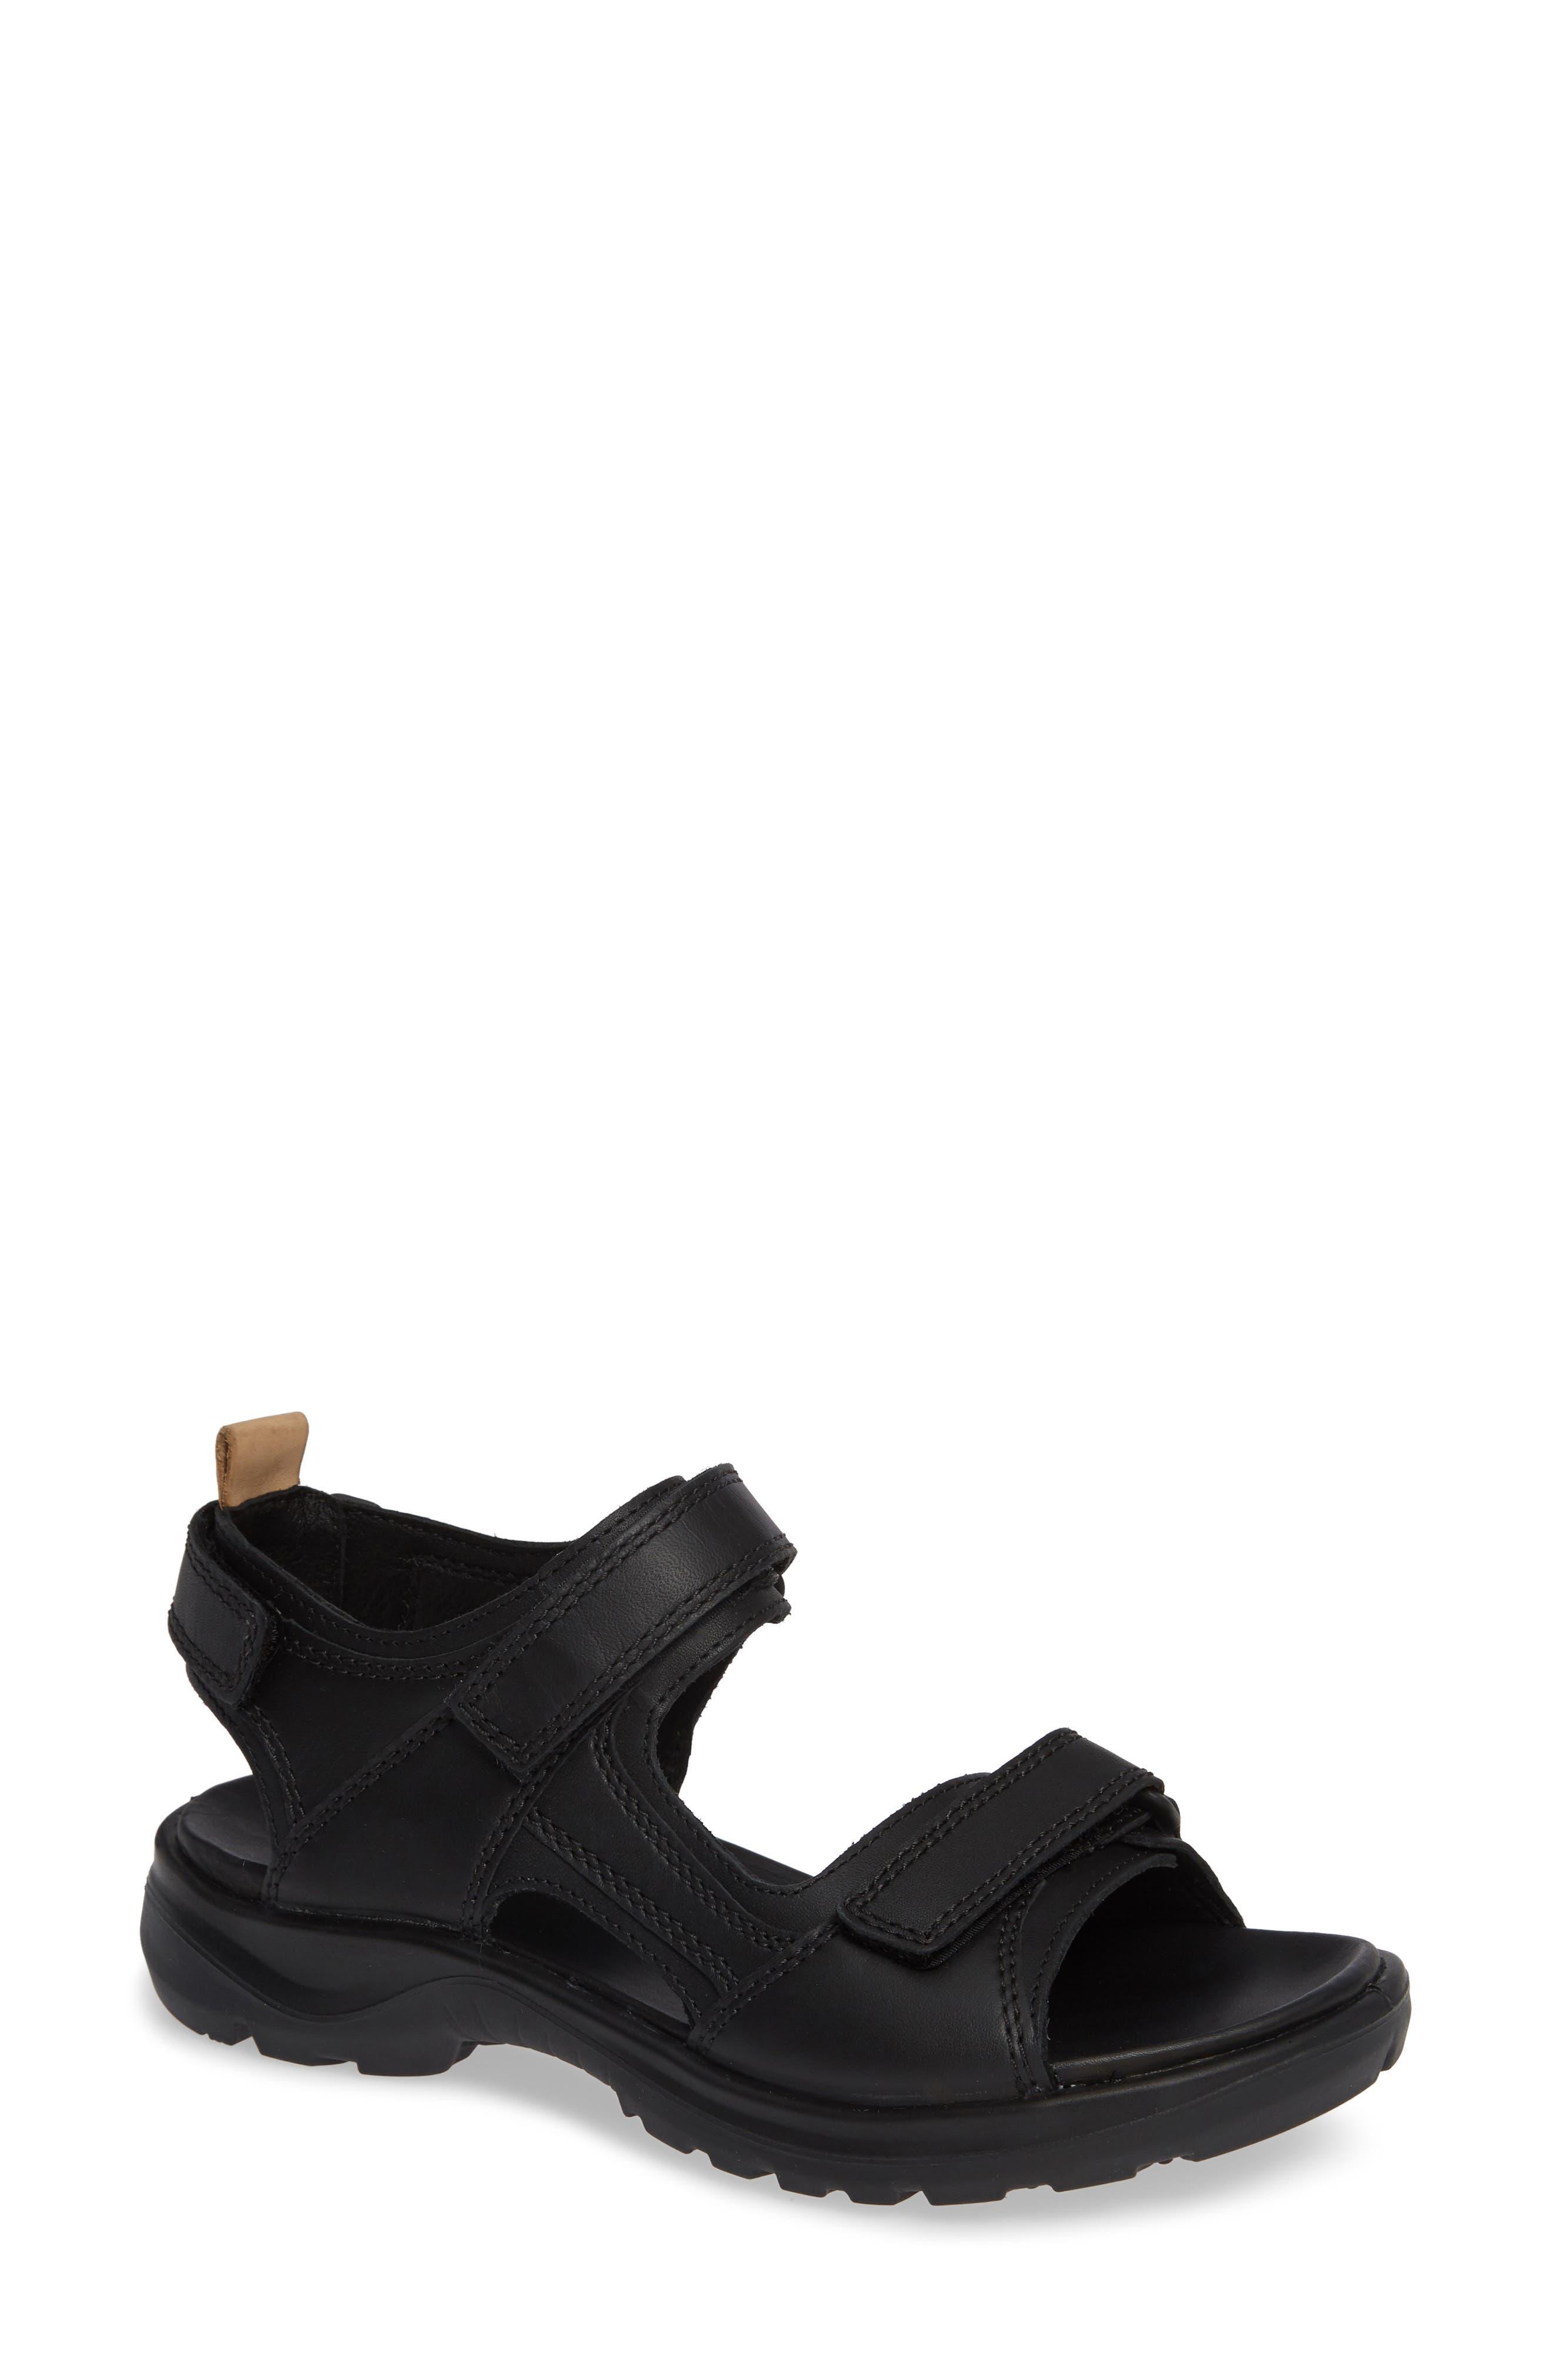 Premium Offroad Sandal,                         Main,                         color, BLACK NUBUCK LEATHER